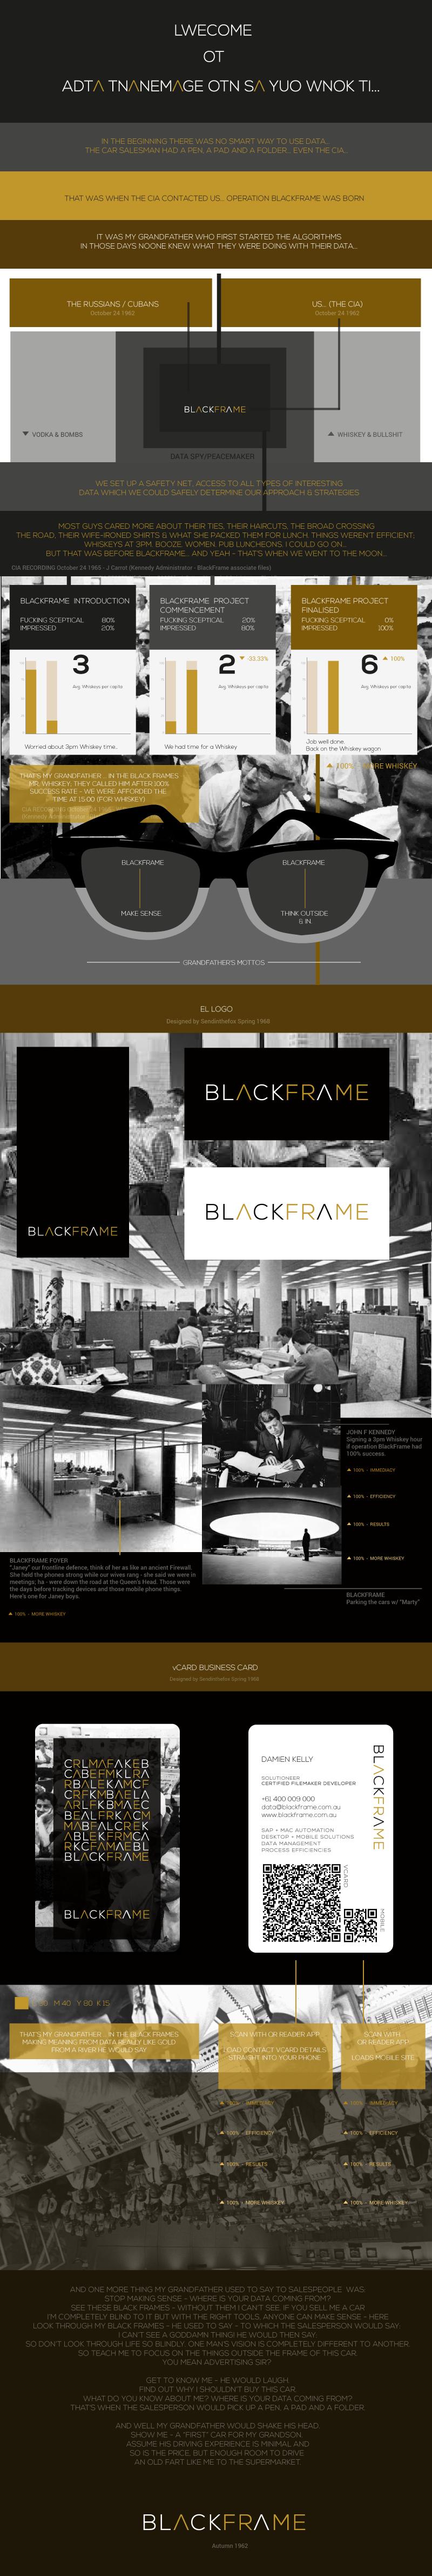 BlackFrame Logo & vCard Business Card – Sendinthefox | Mobile ...